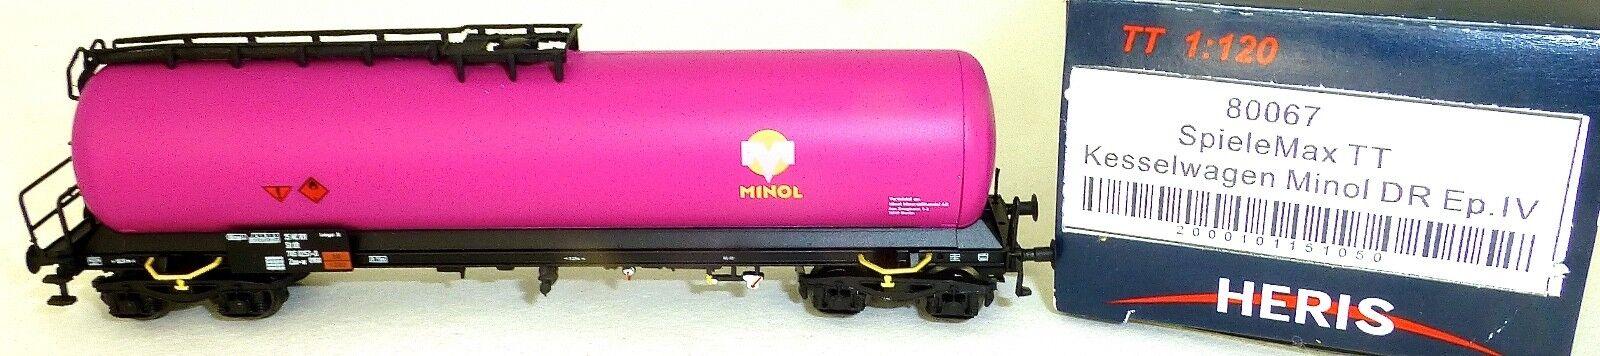 Minol Dr Wagon-citernes ep IV HERIS 80067 TT 1 120 emballage d'origine HL1 µ